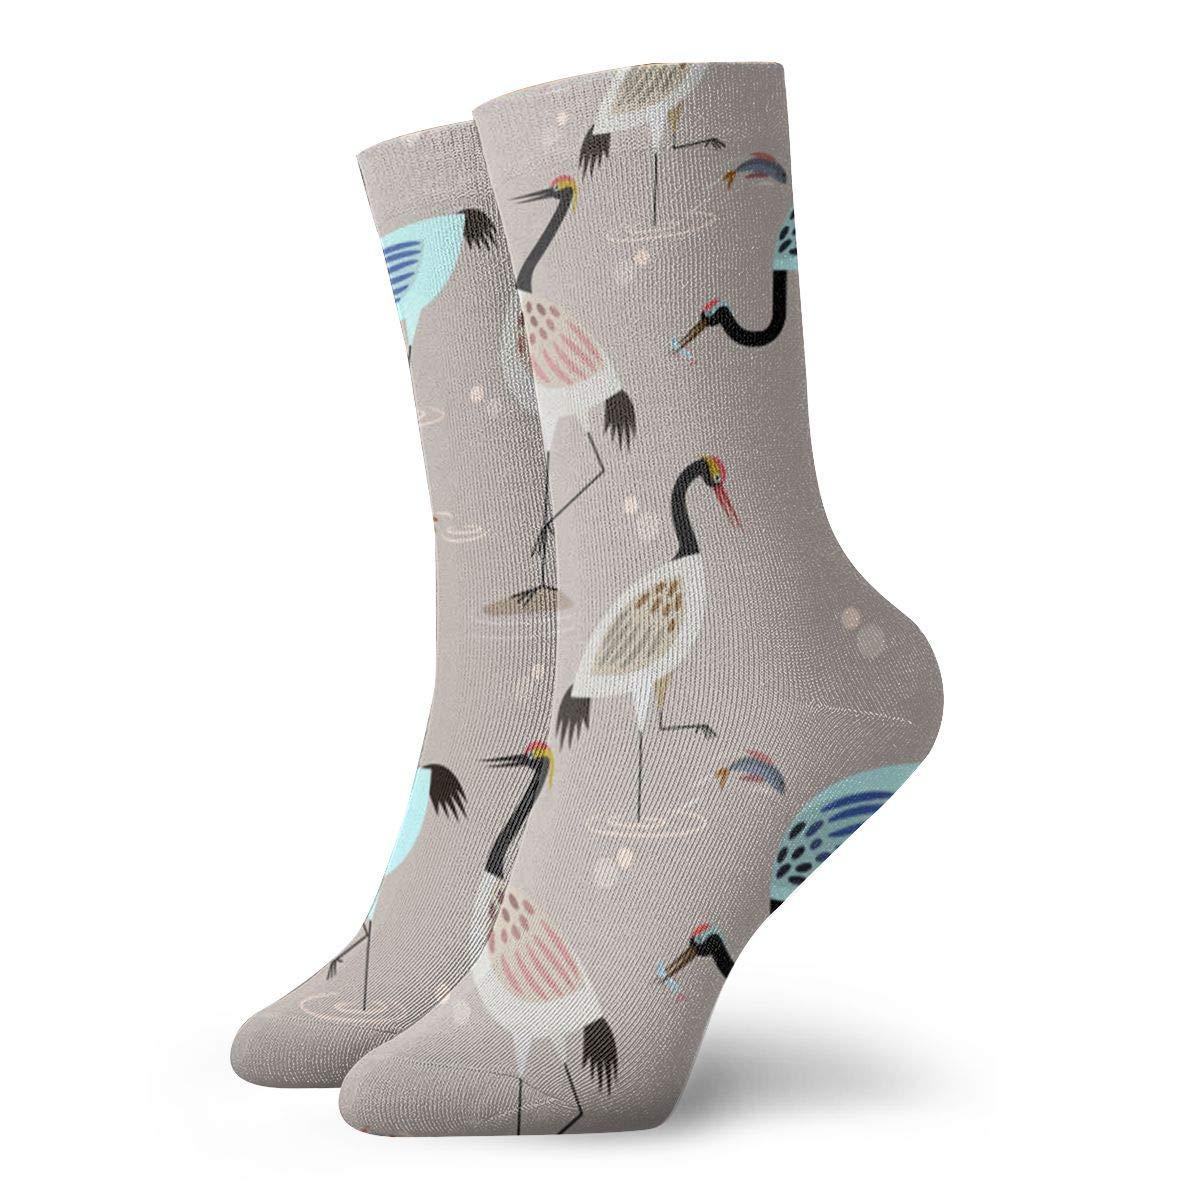 Herons Pond Unisex Funny Casual Crew Socks Athletic Socks For Boys Girls Kids Teenagers